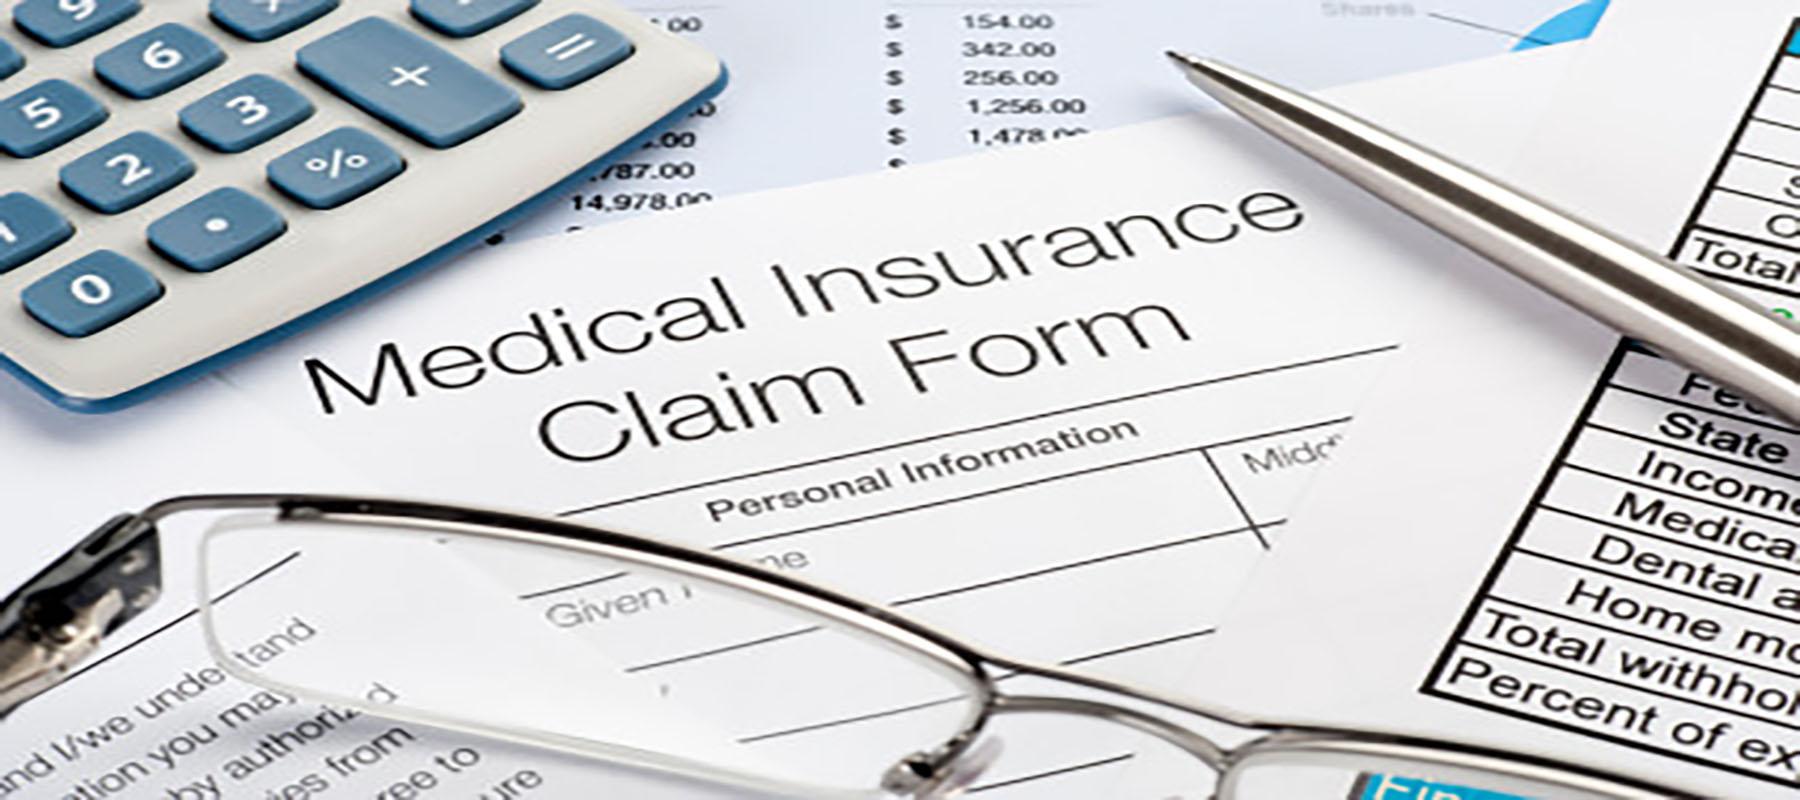 Medical Claim Form3